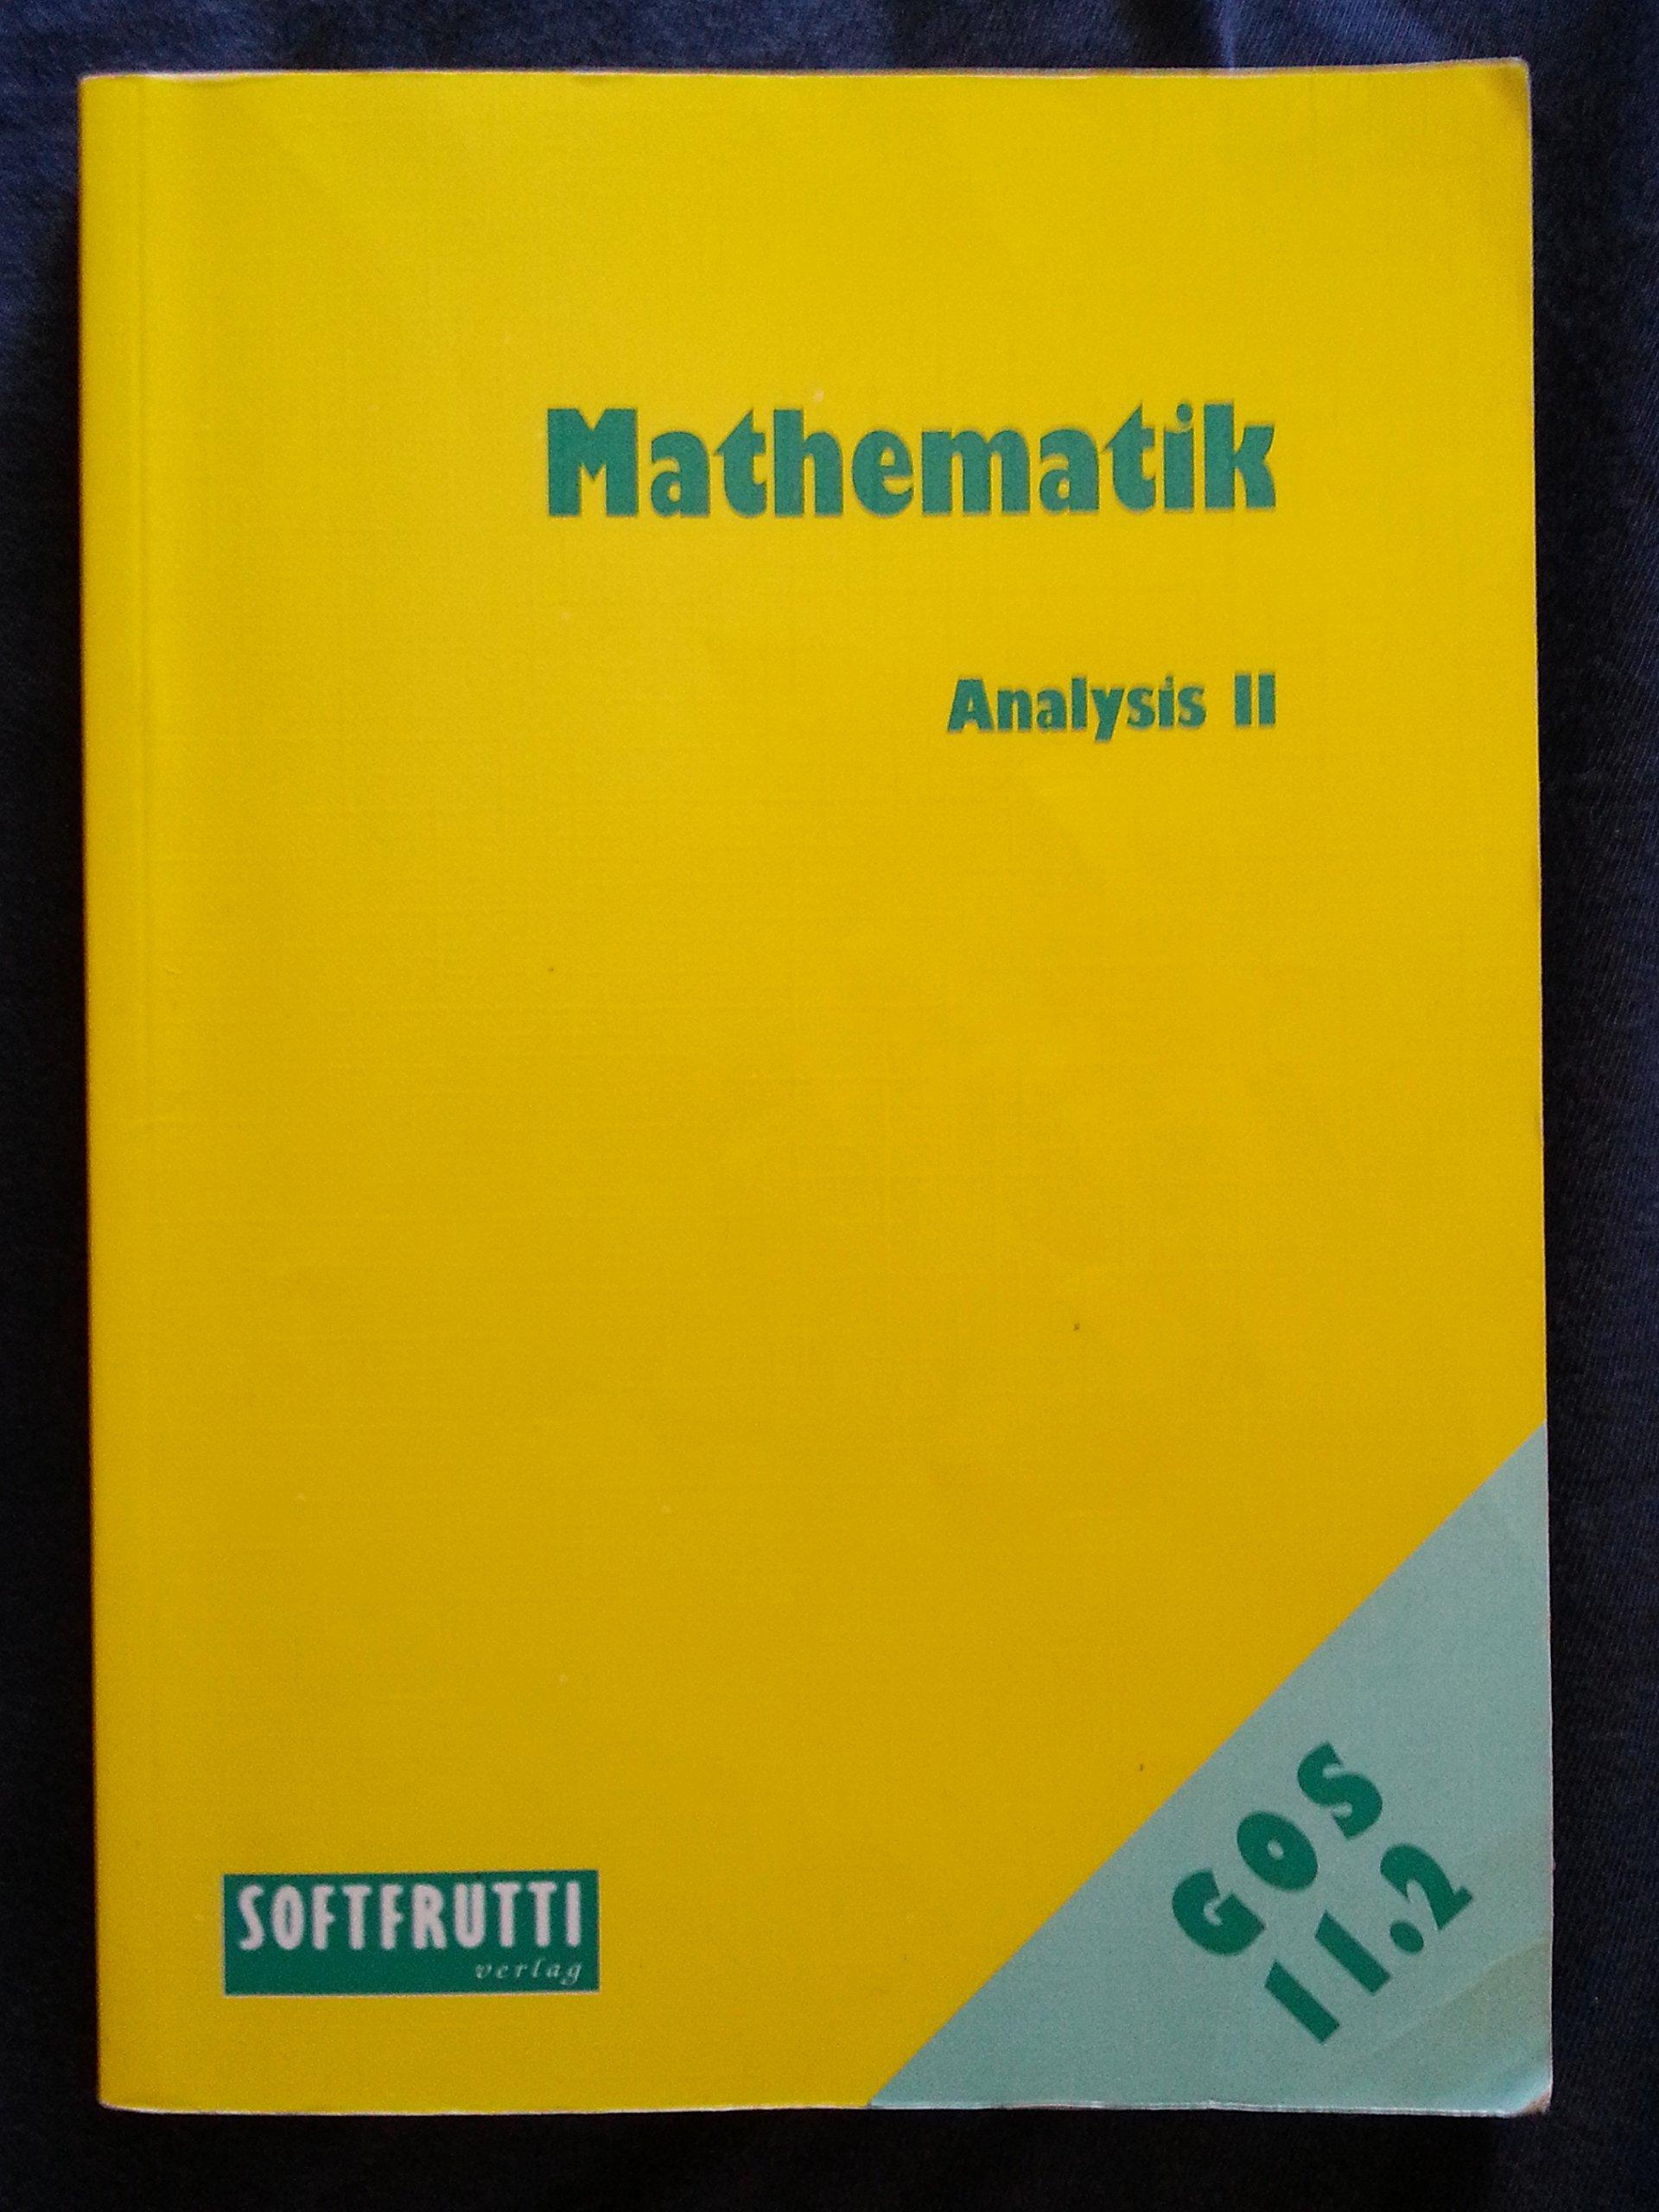 Mathematik 11.2: Analysis II